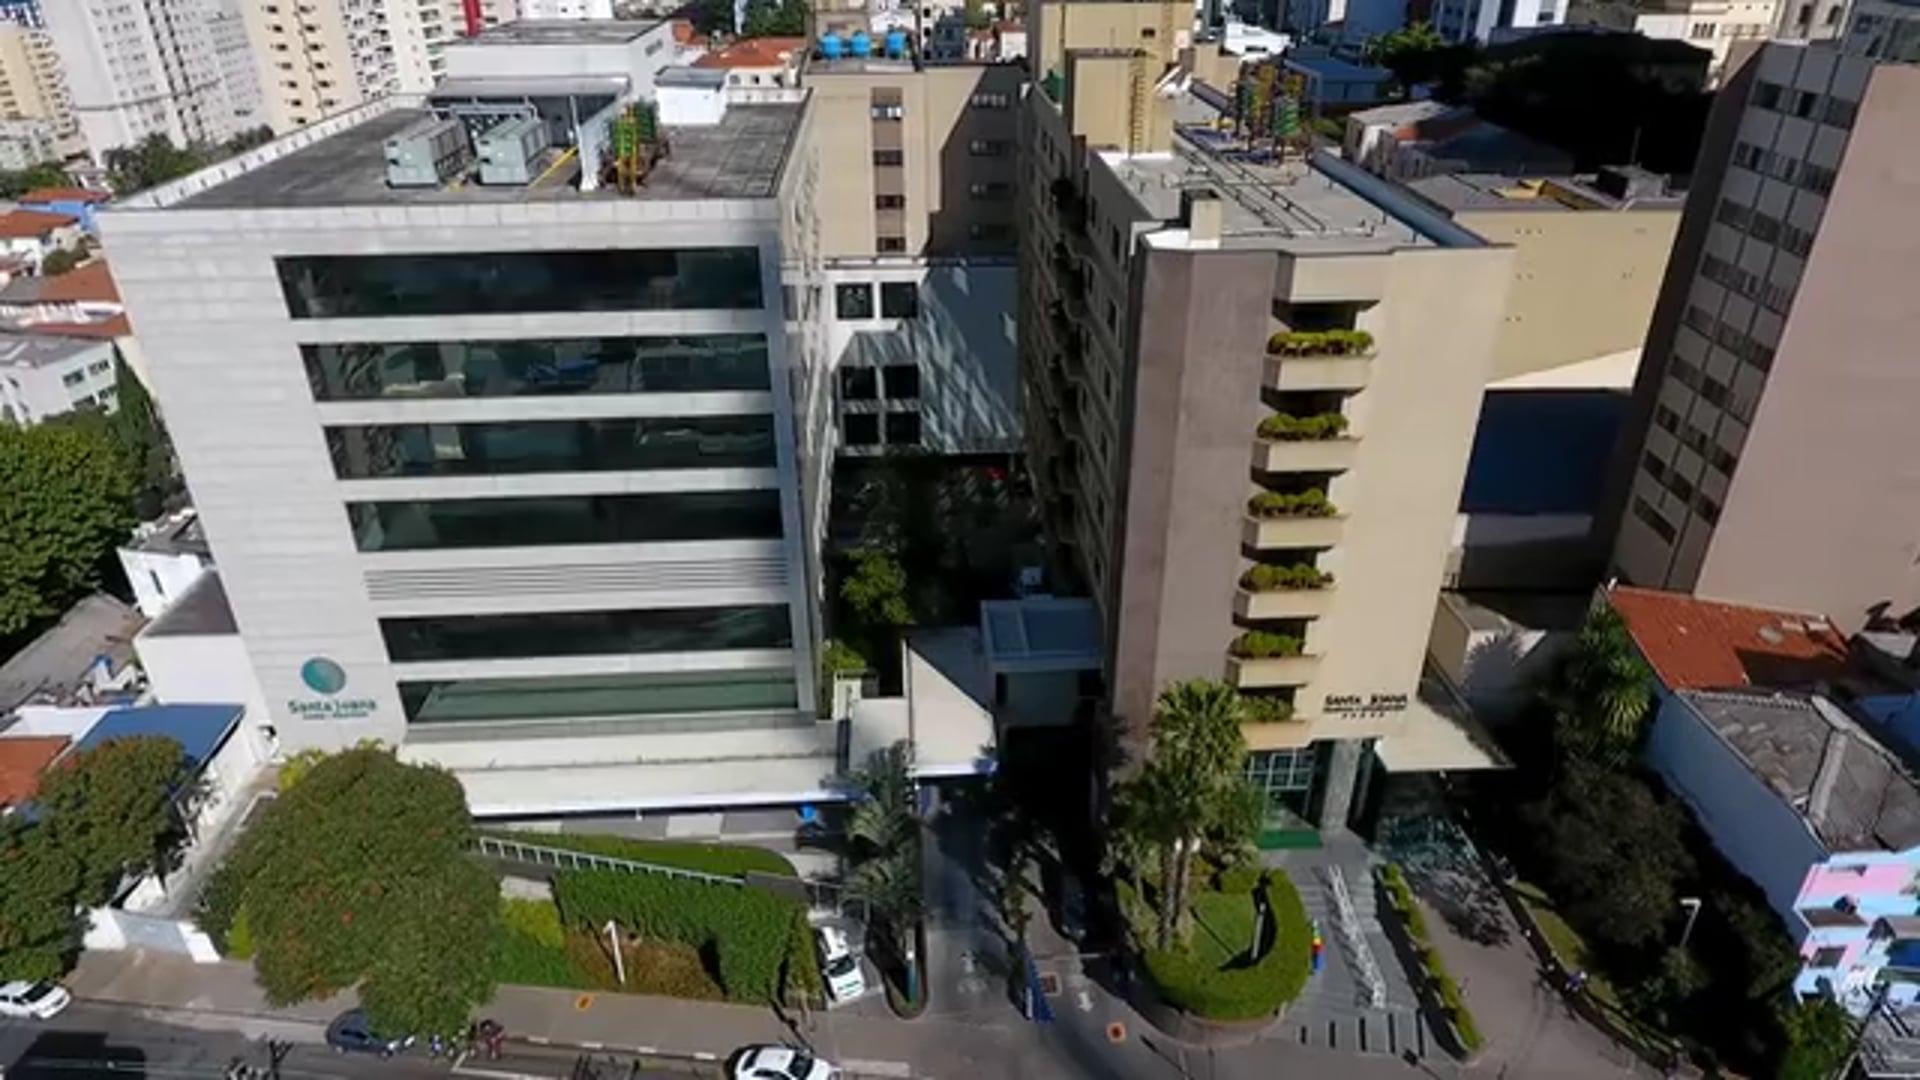 Vista Aérea Hospital Santa Joana